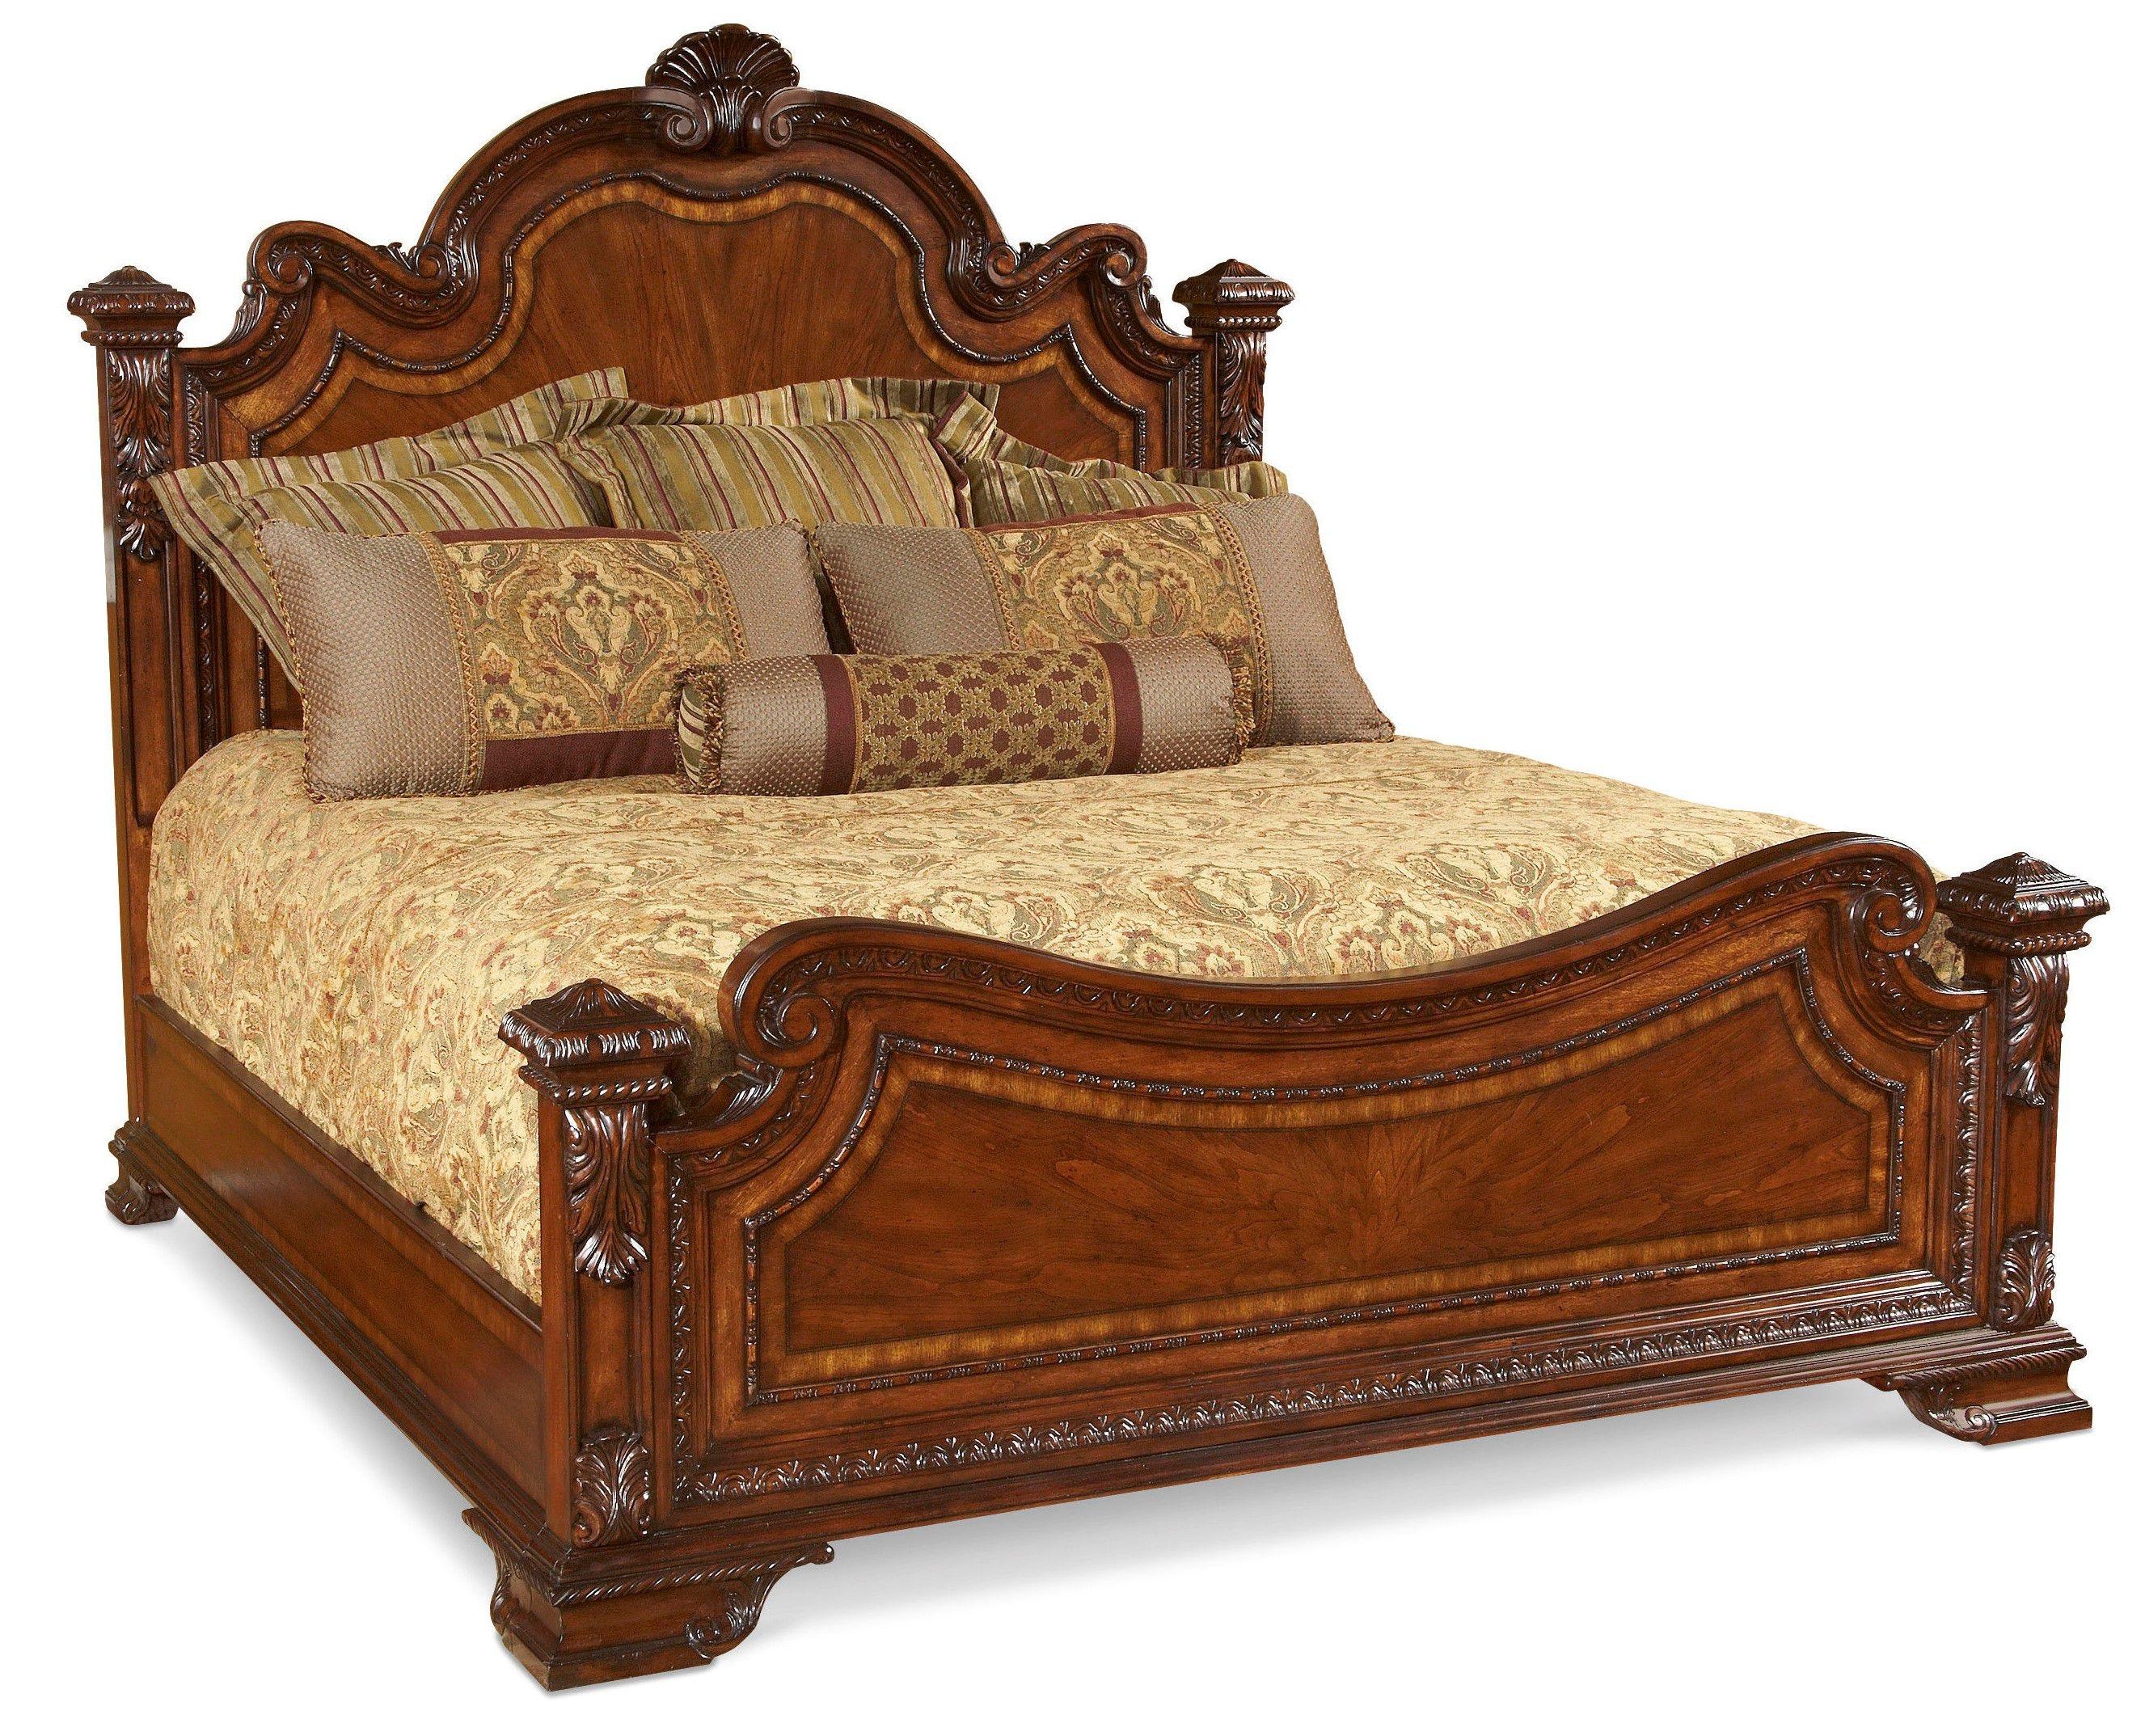 Art Furniture Bedroom 6 0 California King Estate Bed 143157 2606